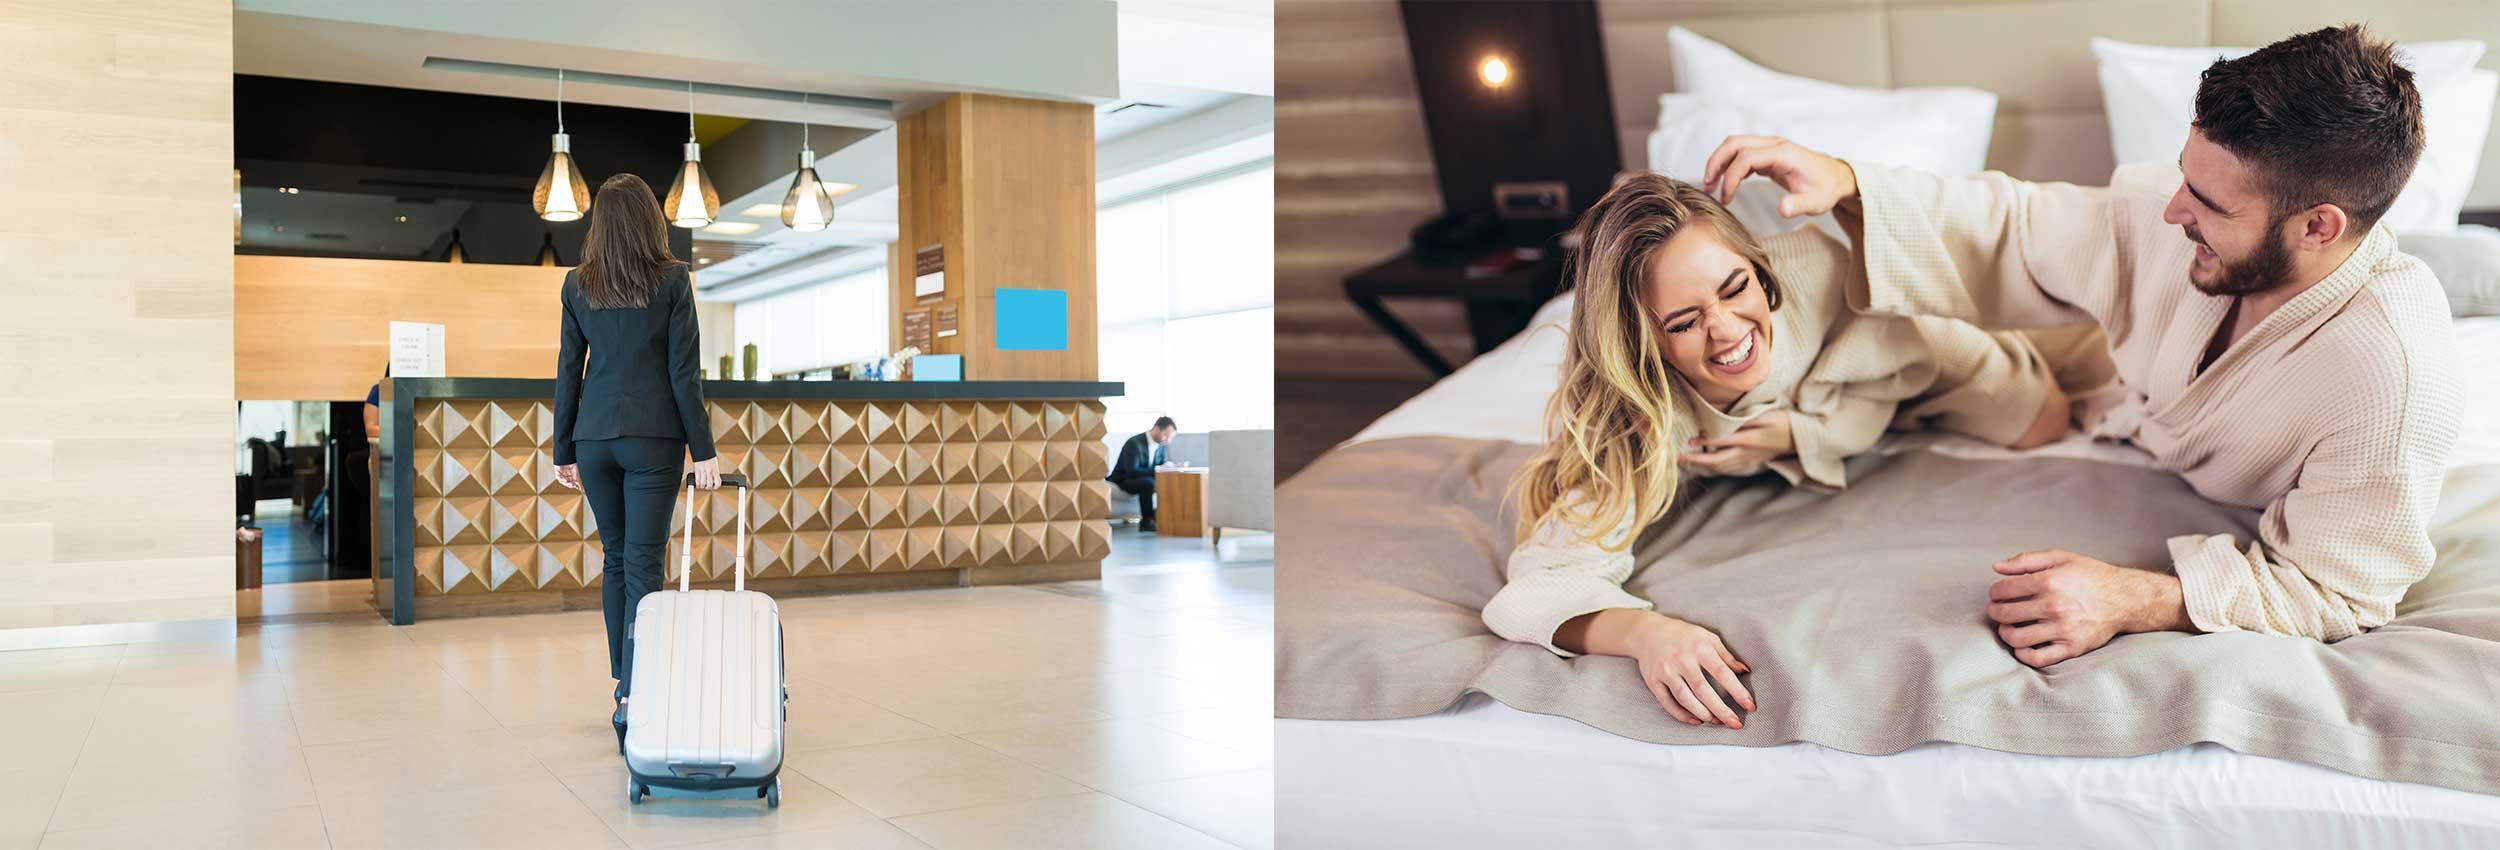 Accueil, chambre hotel